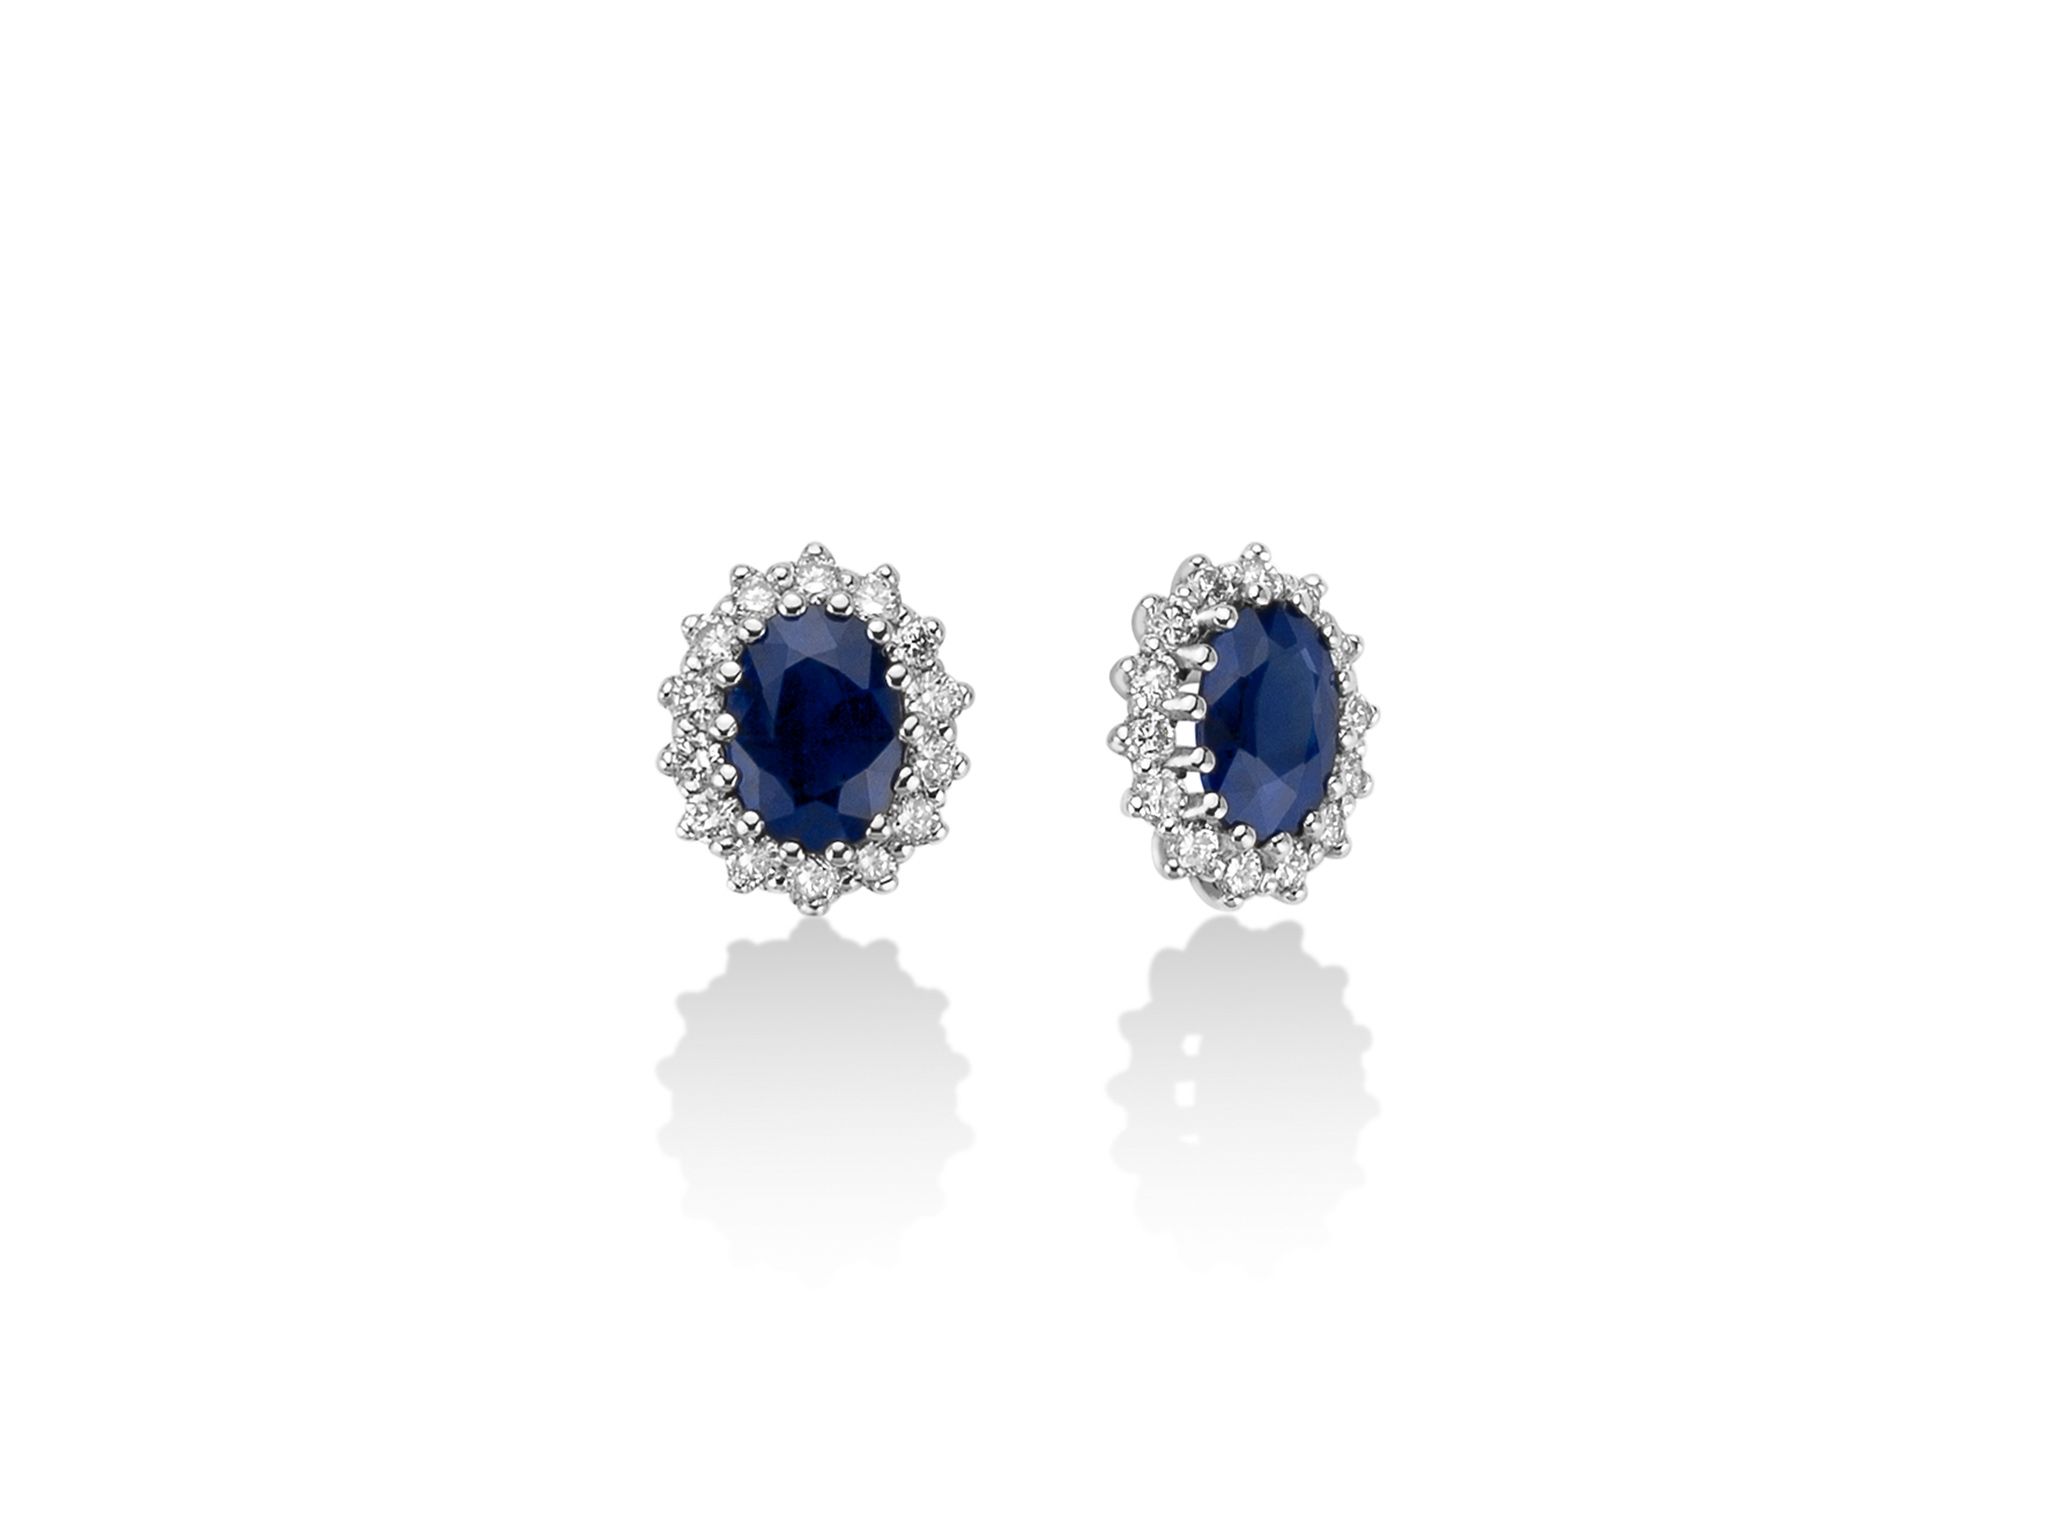 Orecchini in oro, diamanti e zaffiro. - ERD2498